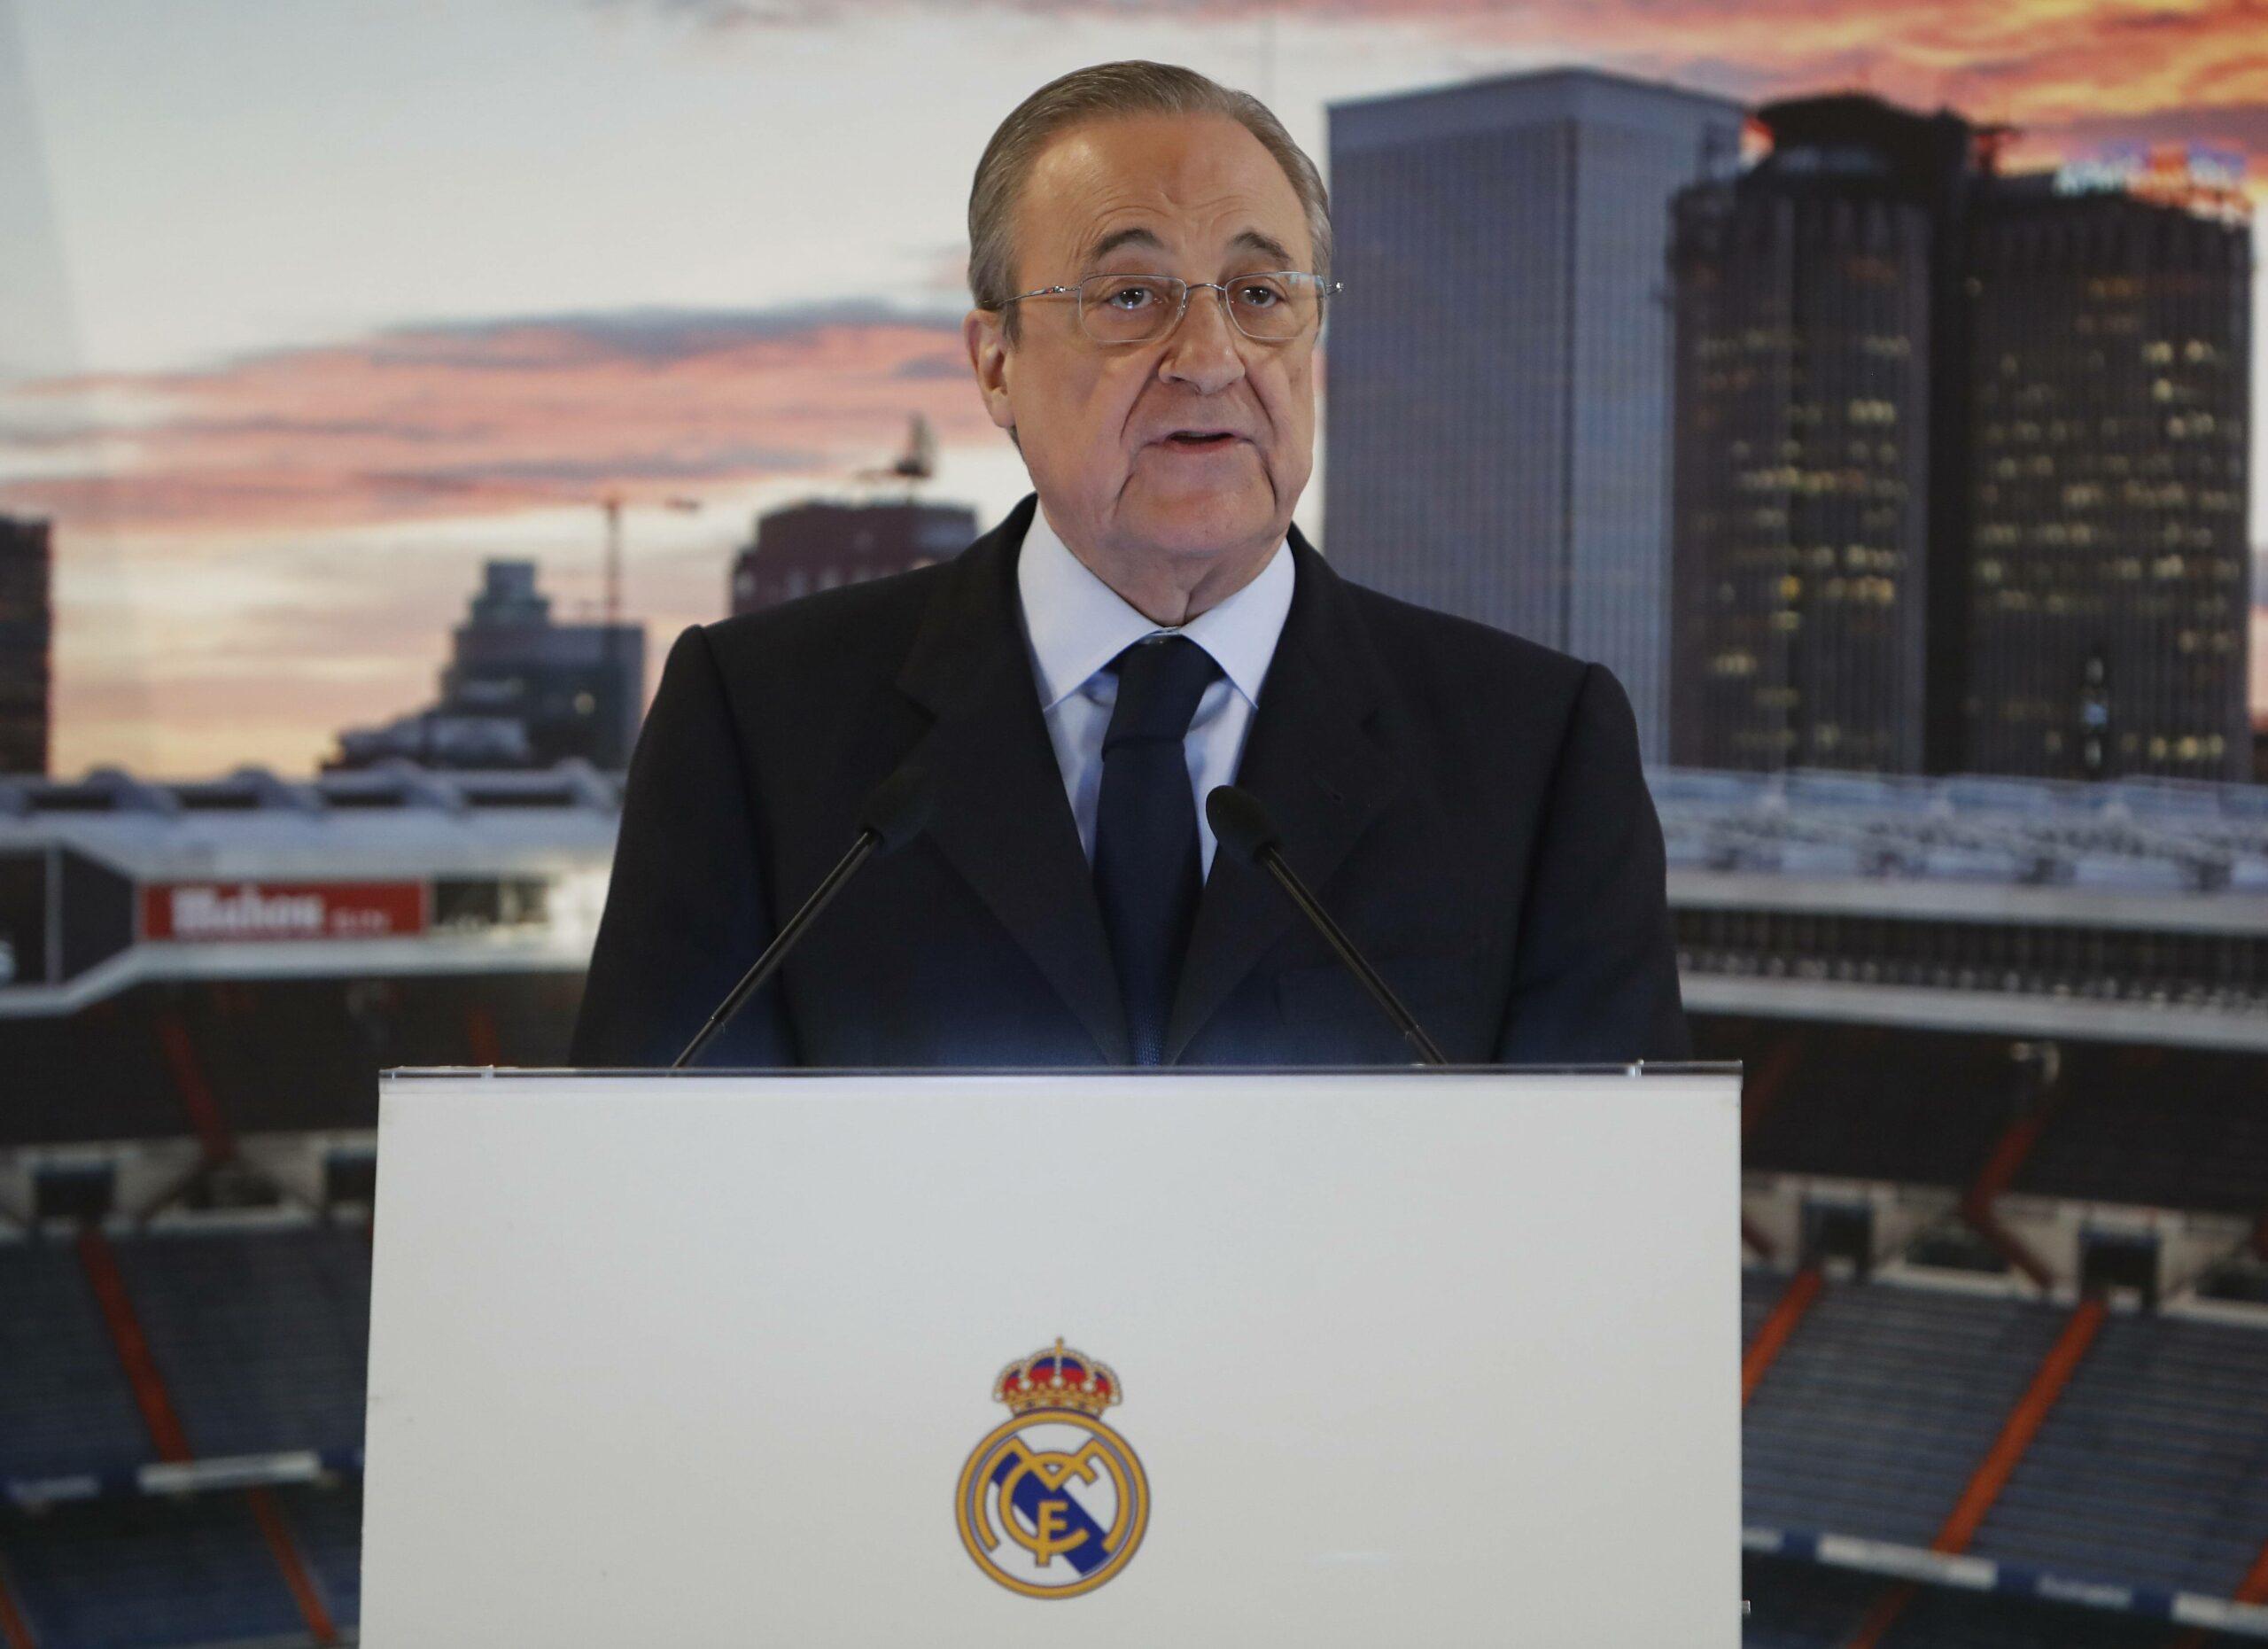 Florentino Pérez (Real Madrid)